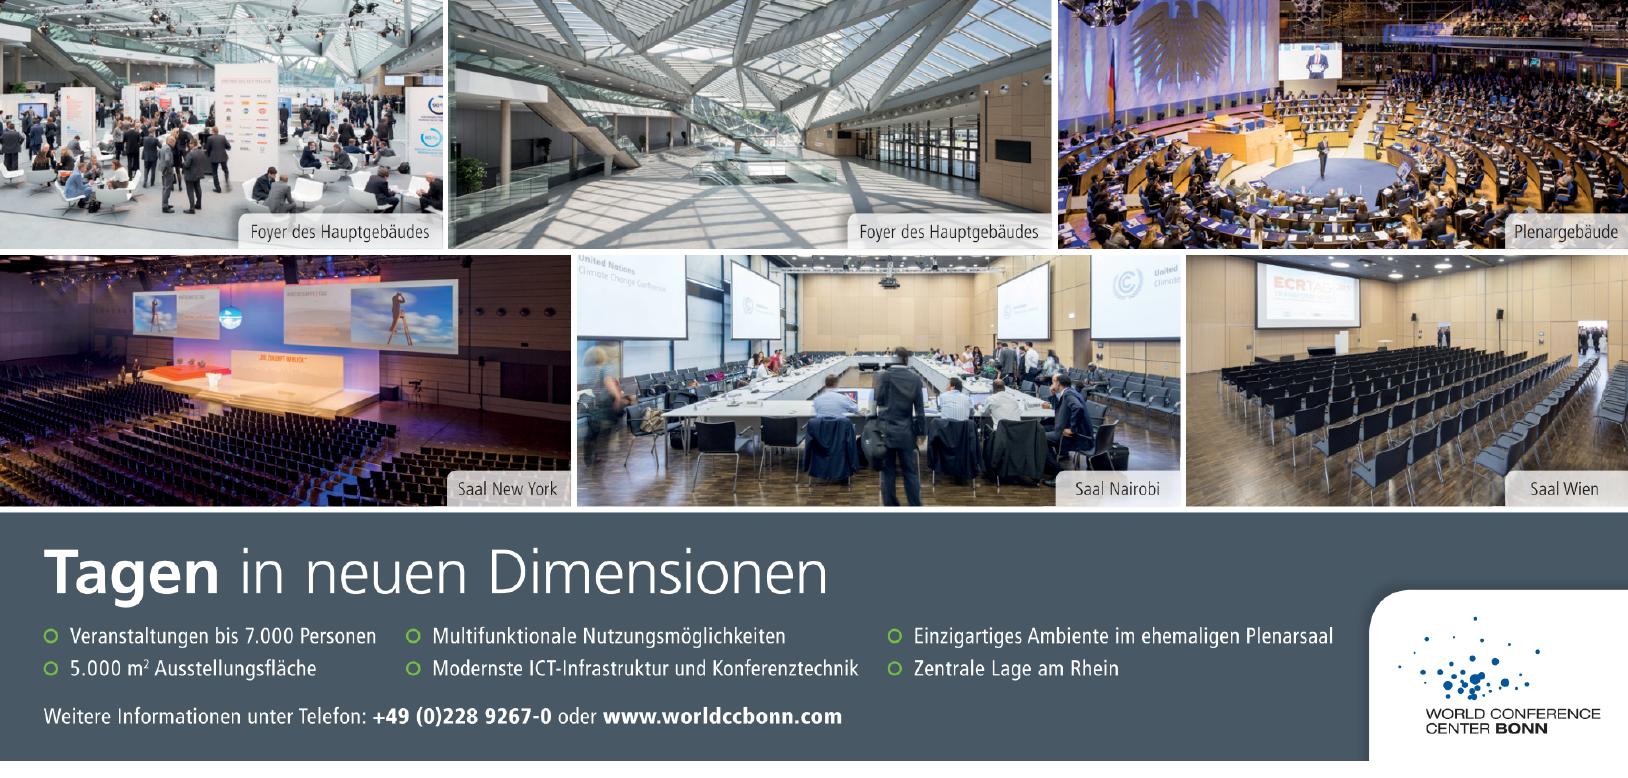 Bonn Conference Center